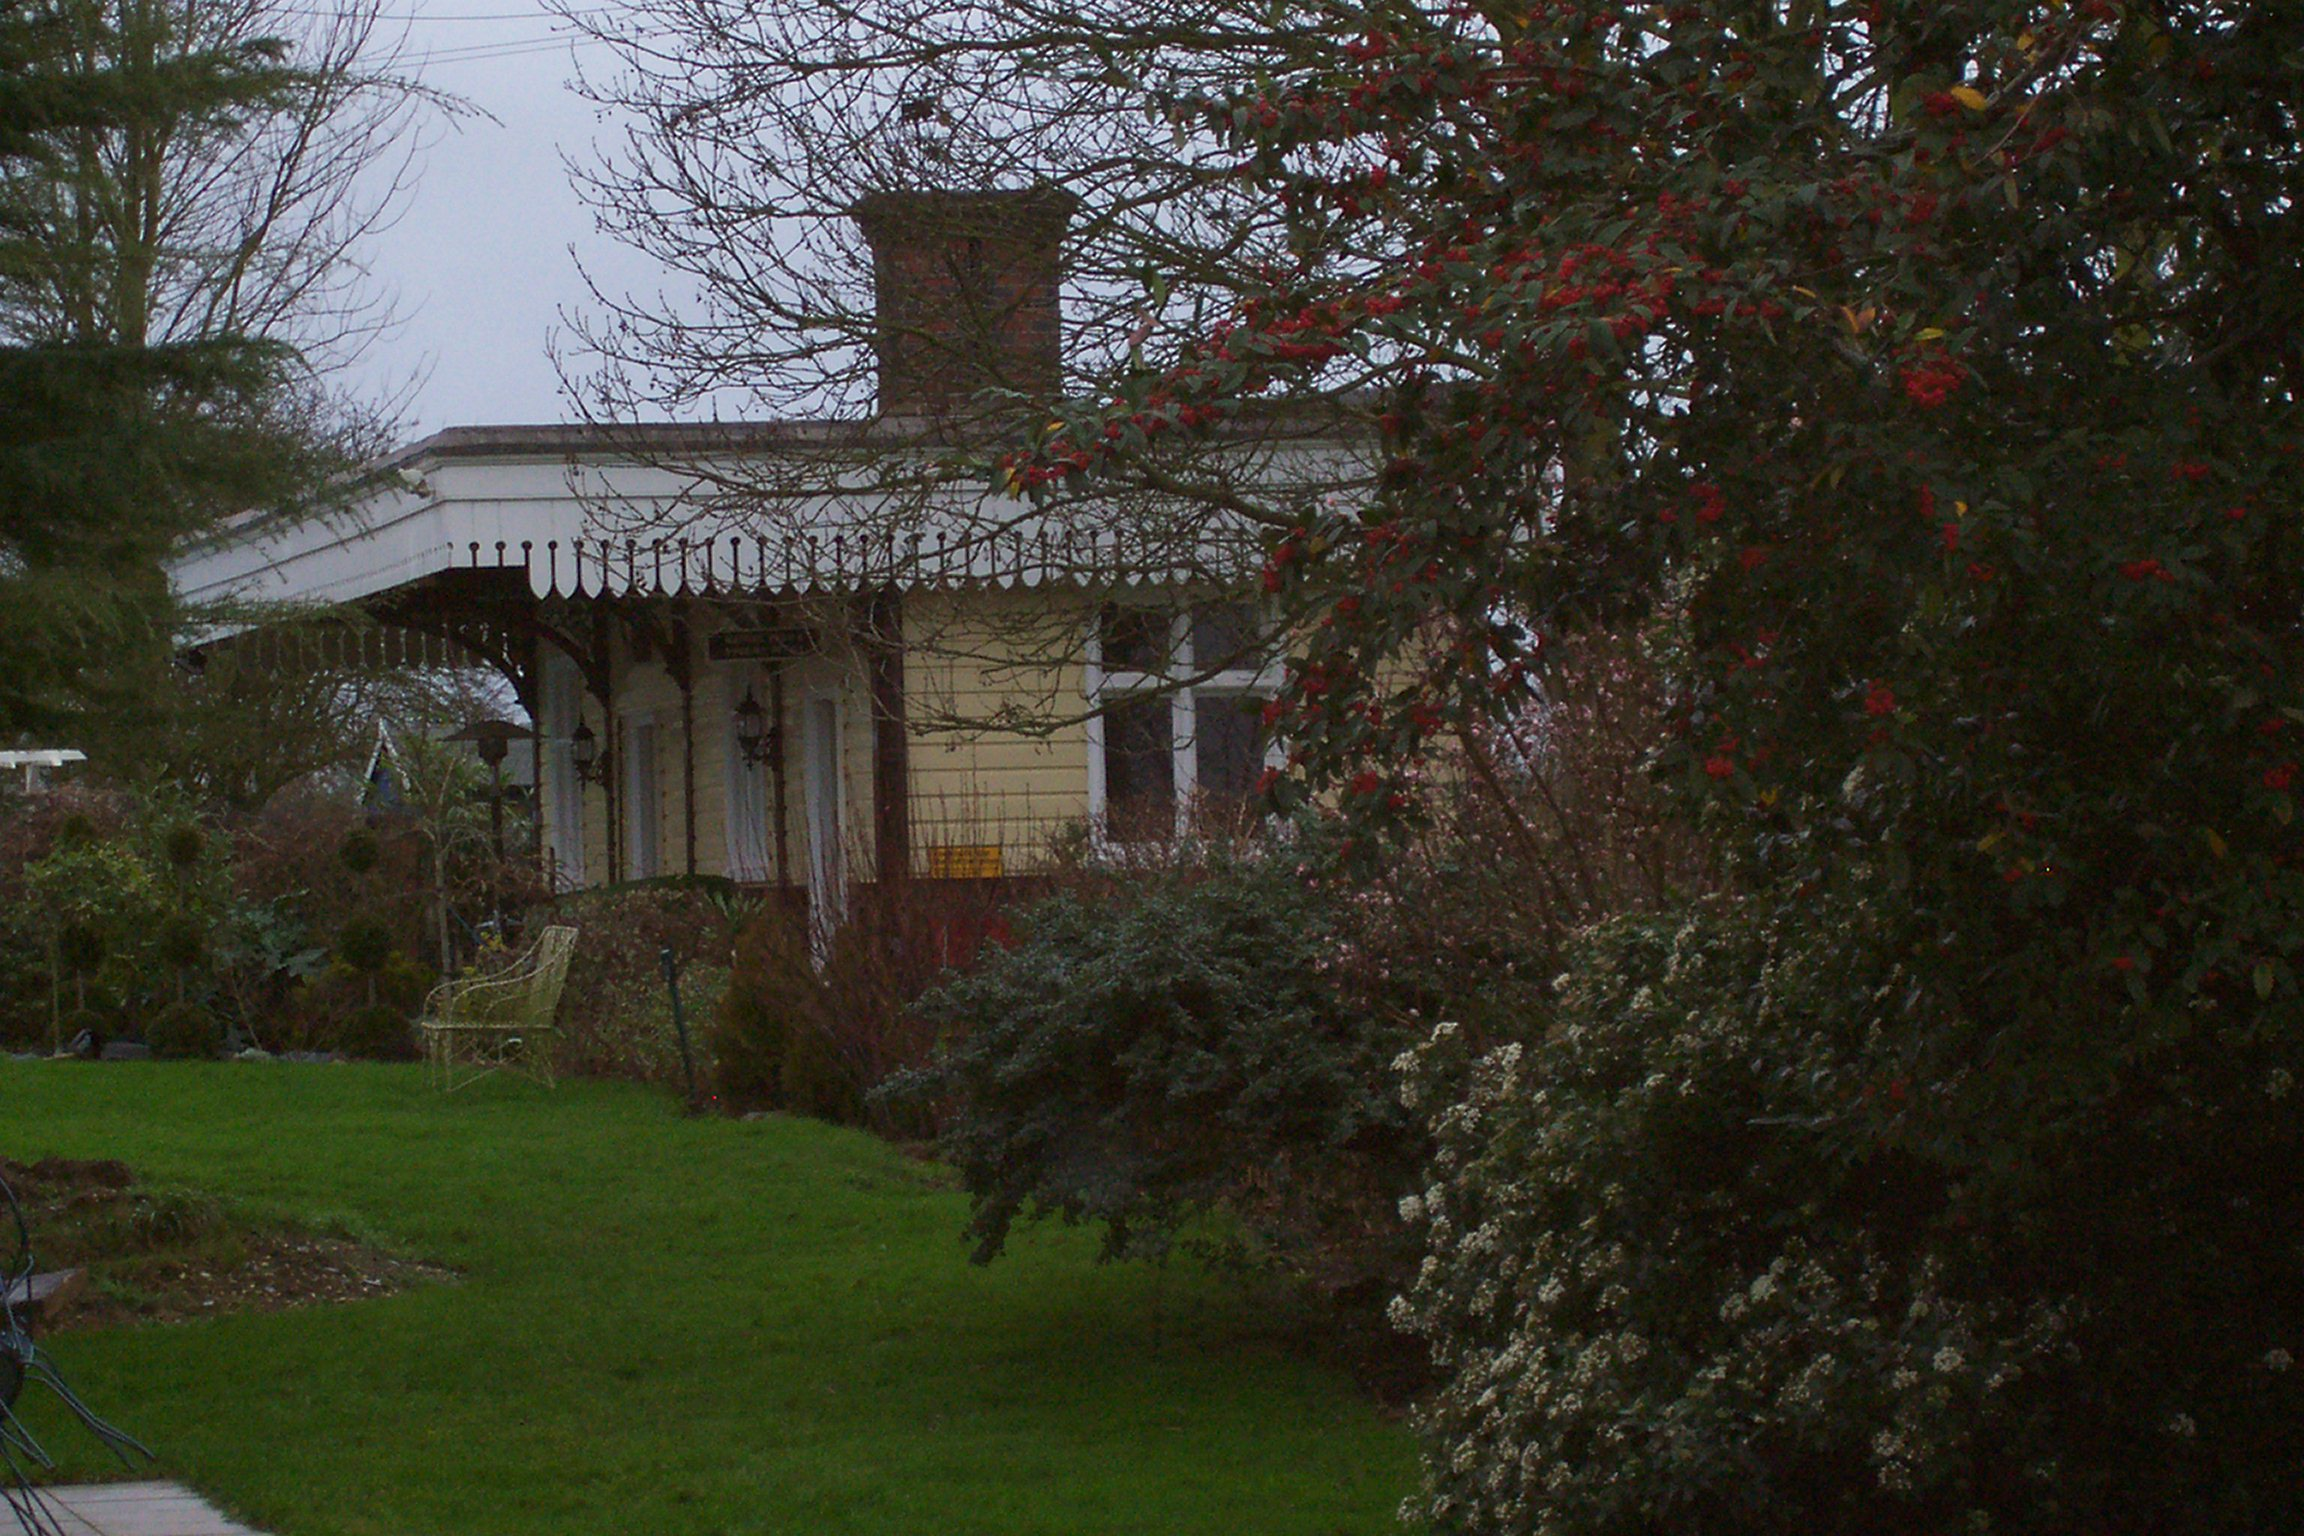 Theddingworth Station